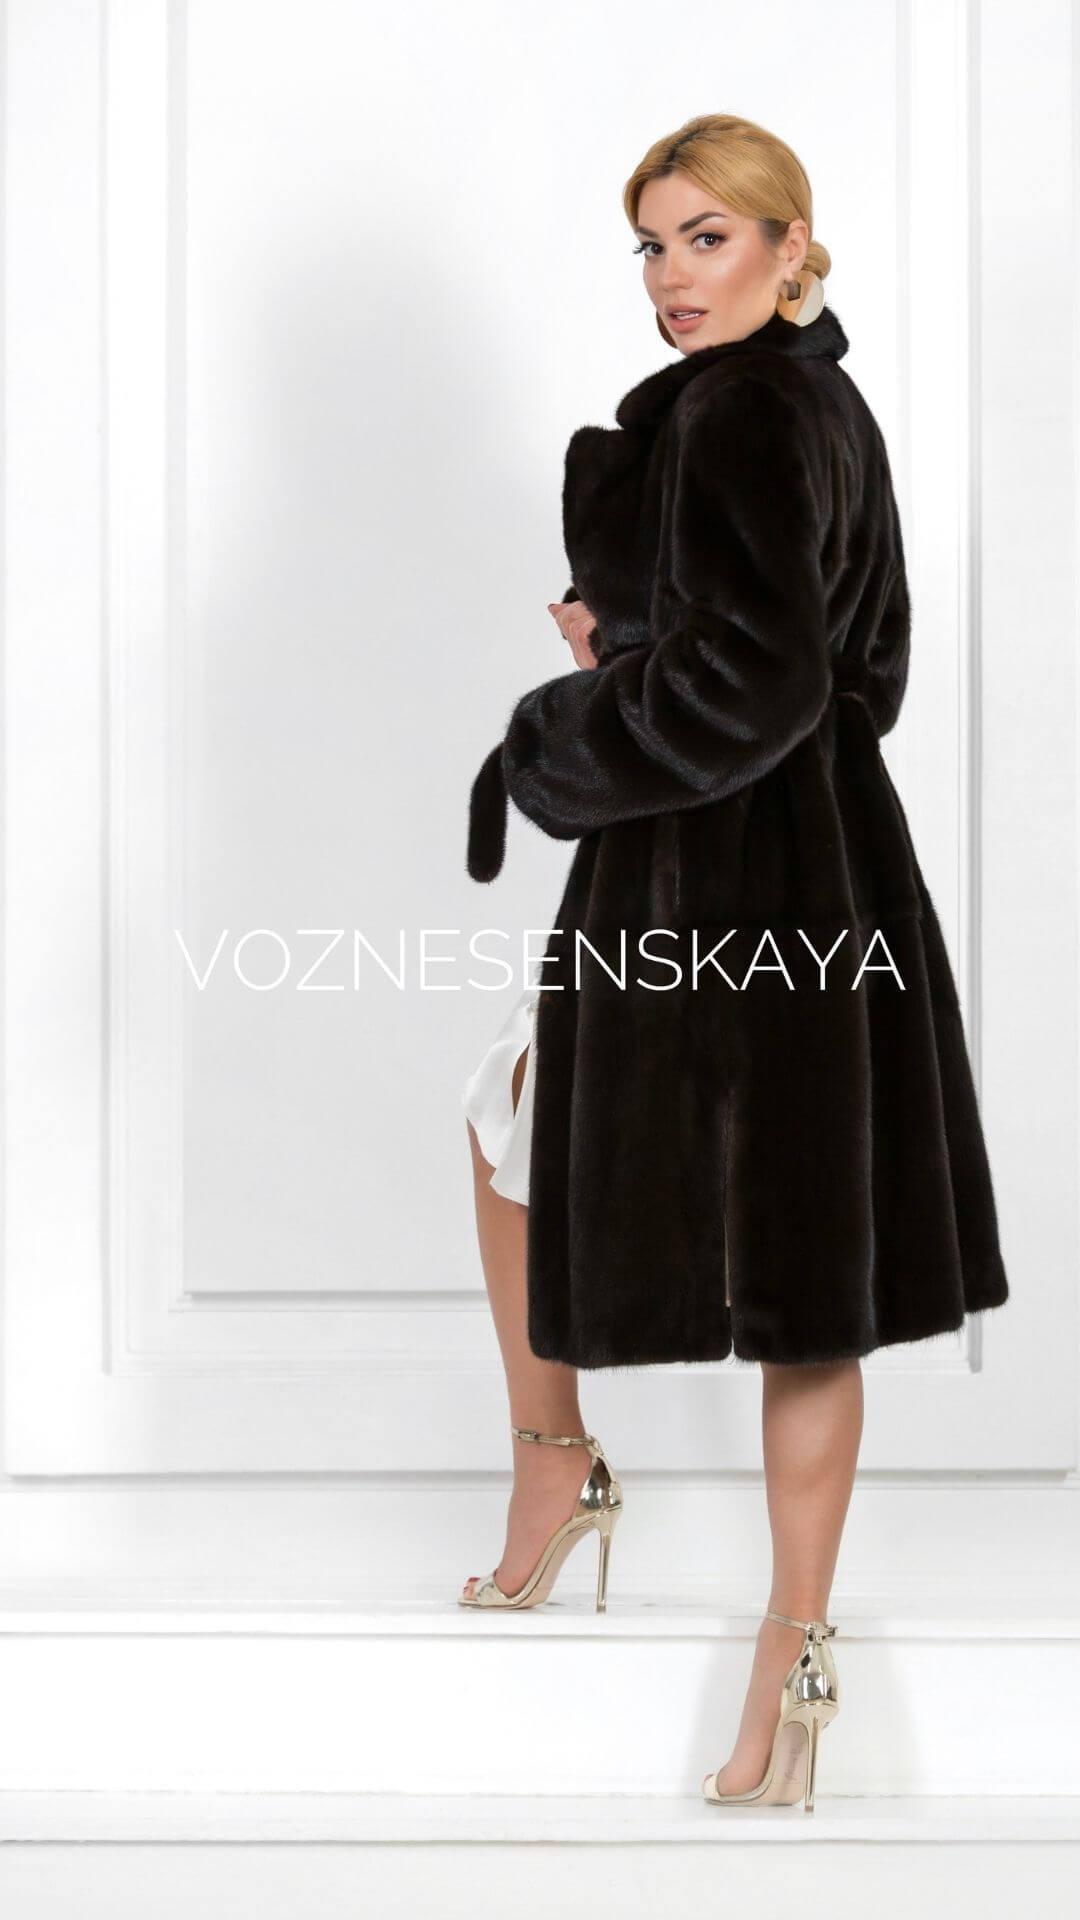 Sewing mink coats Kiev